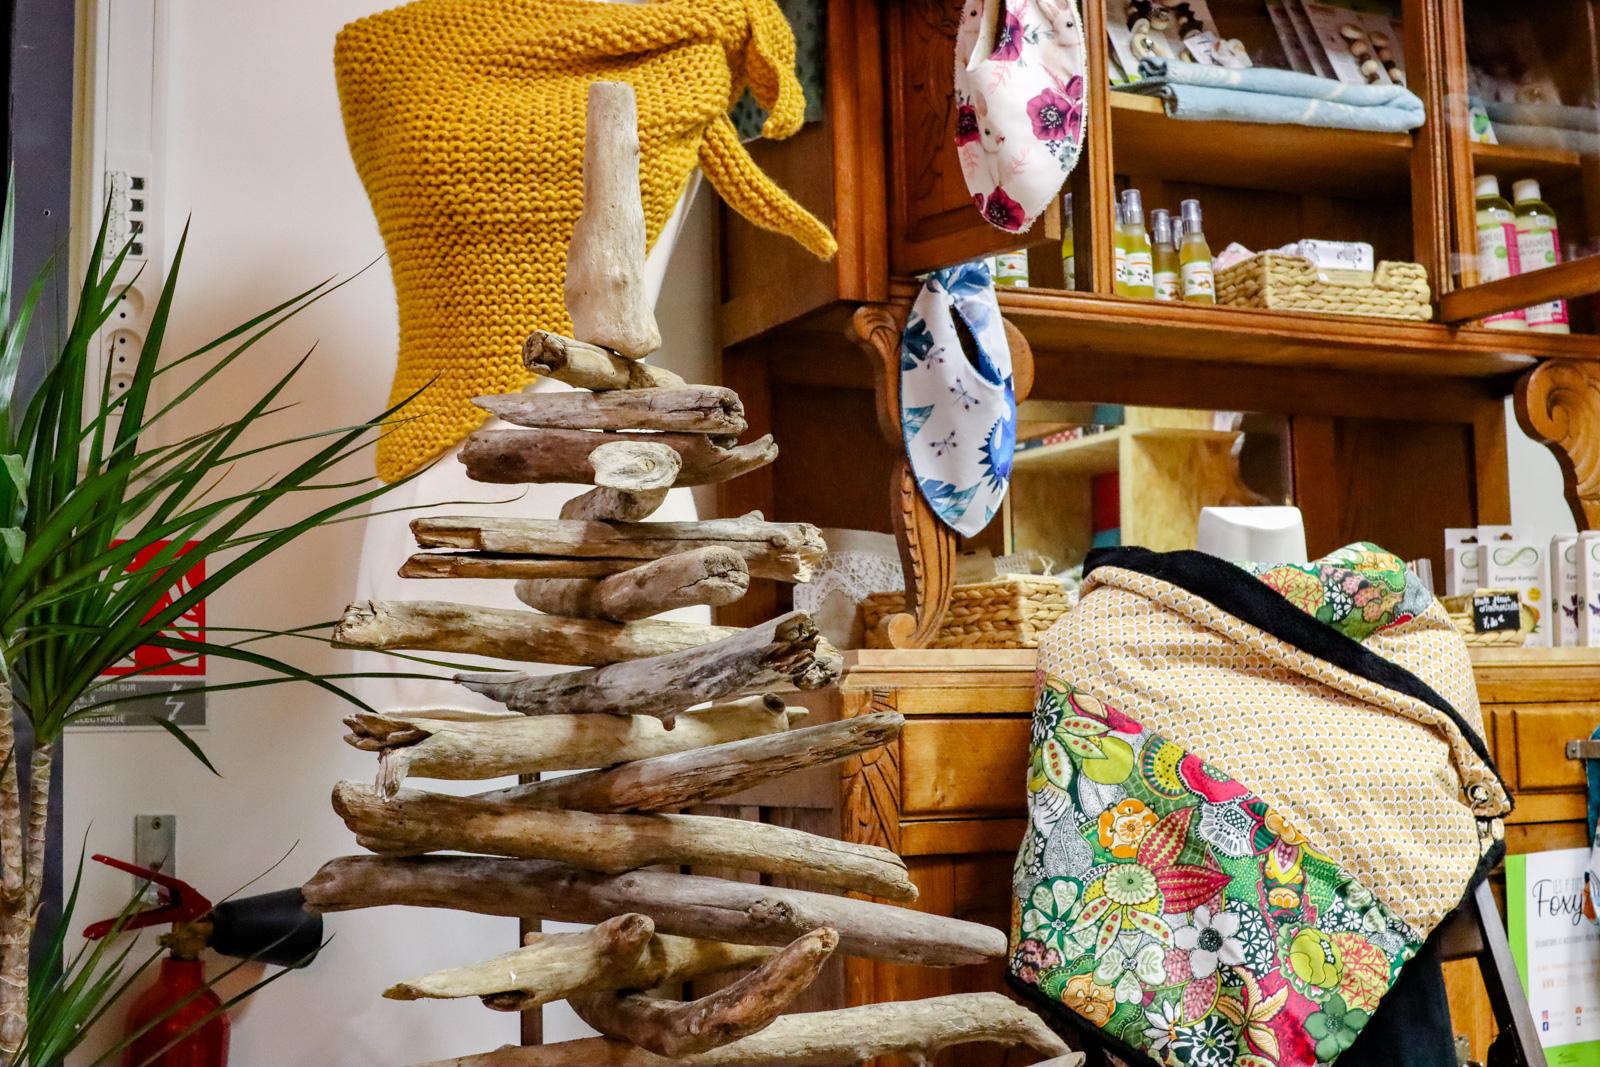 Objets artisanaux à Sommières, Gard